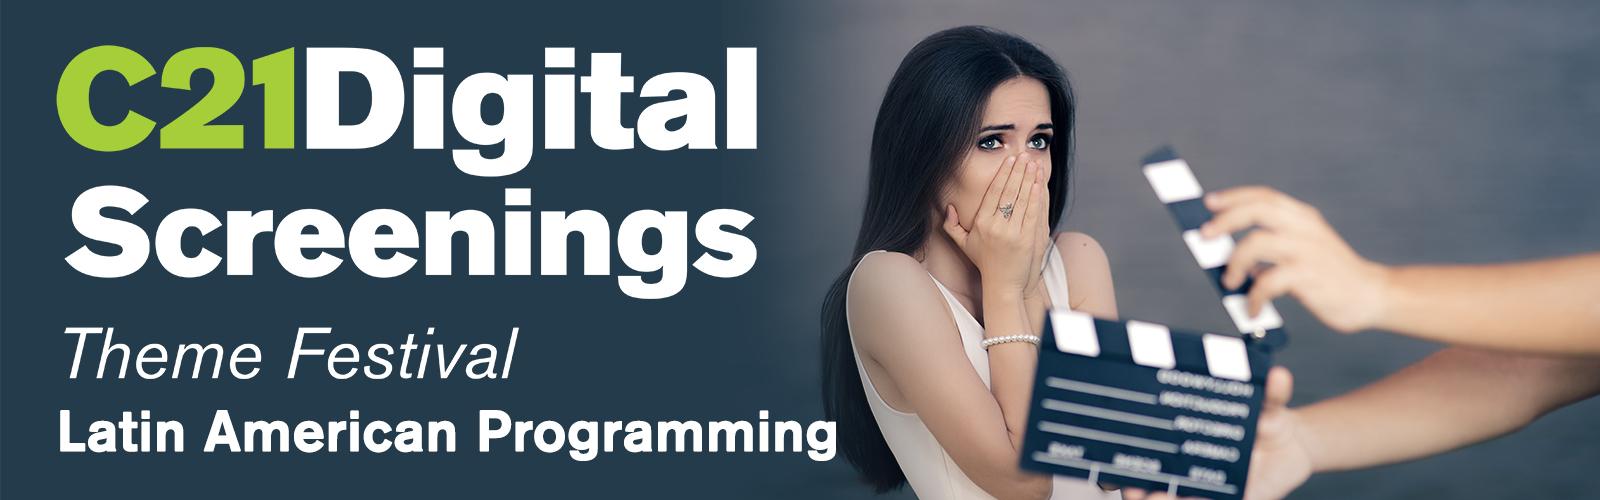 Theme Festival - Latin American Programming